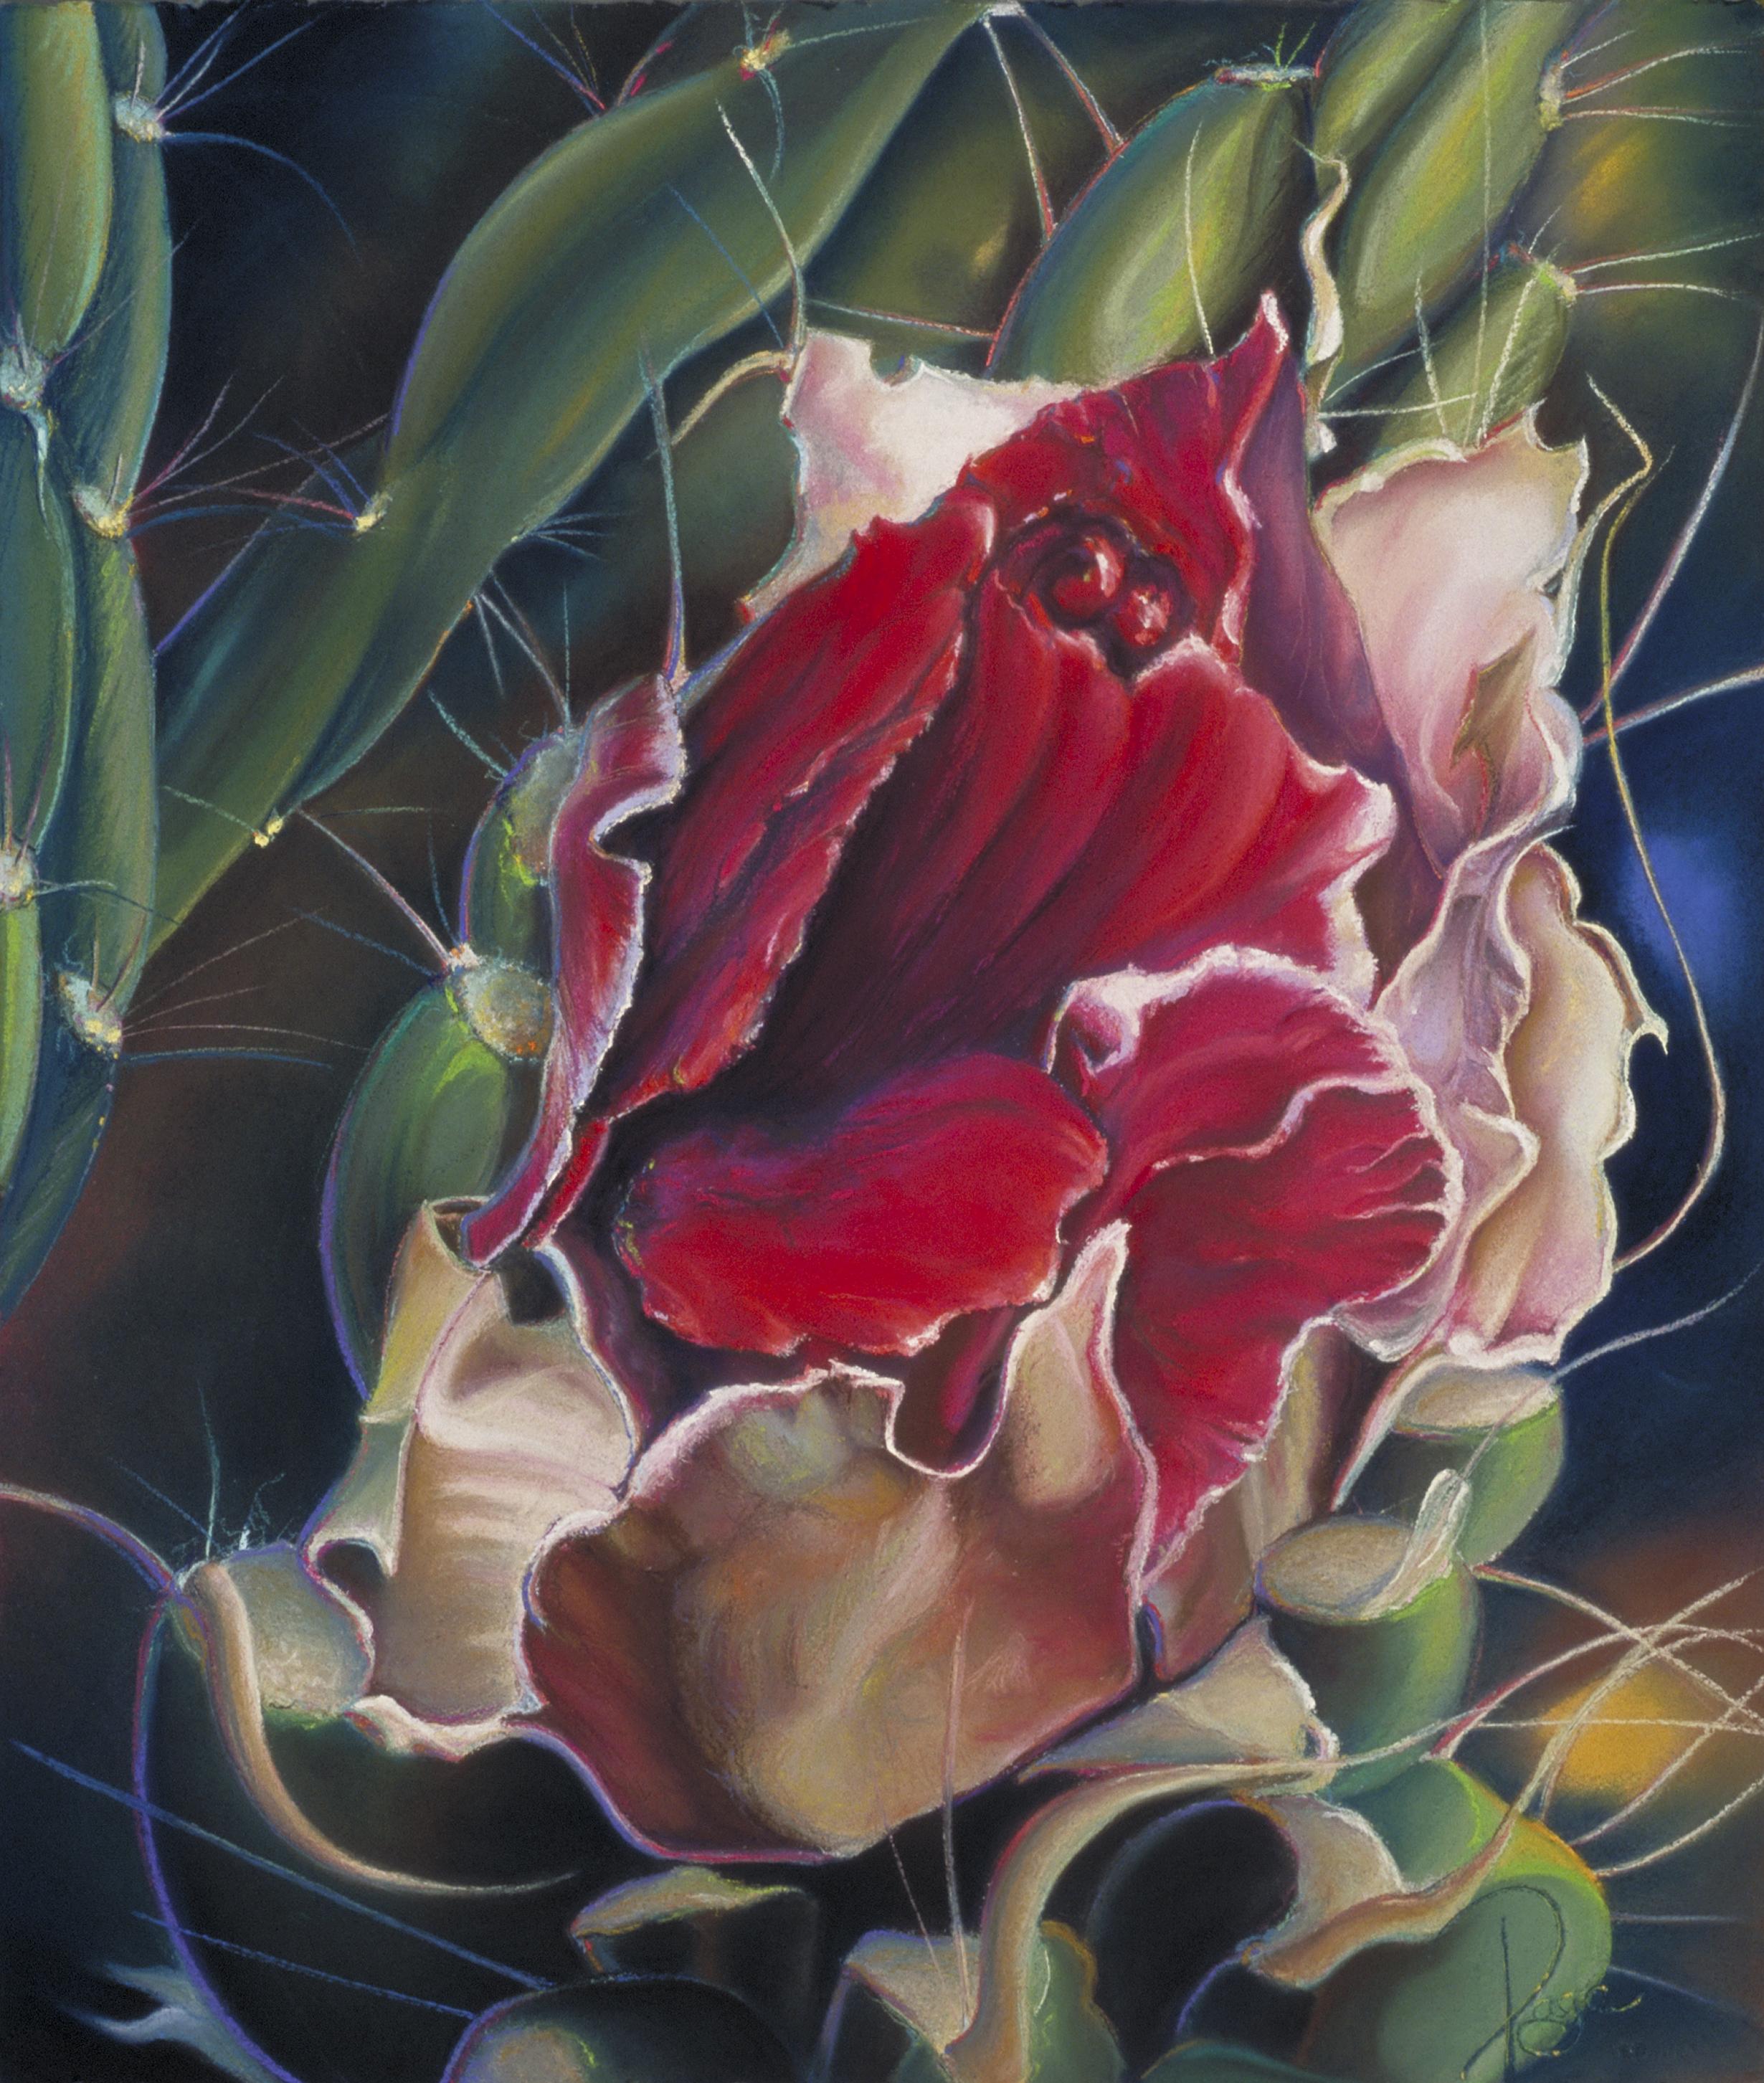 Chimayo Cactus